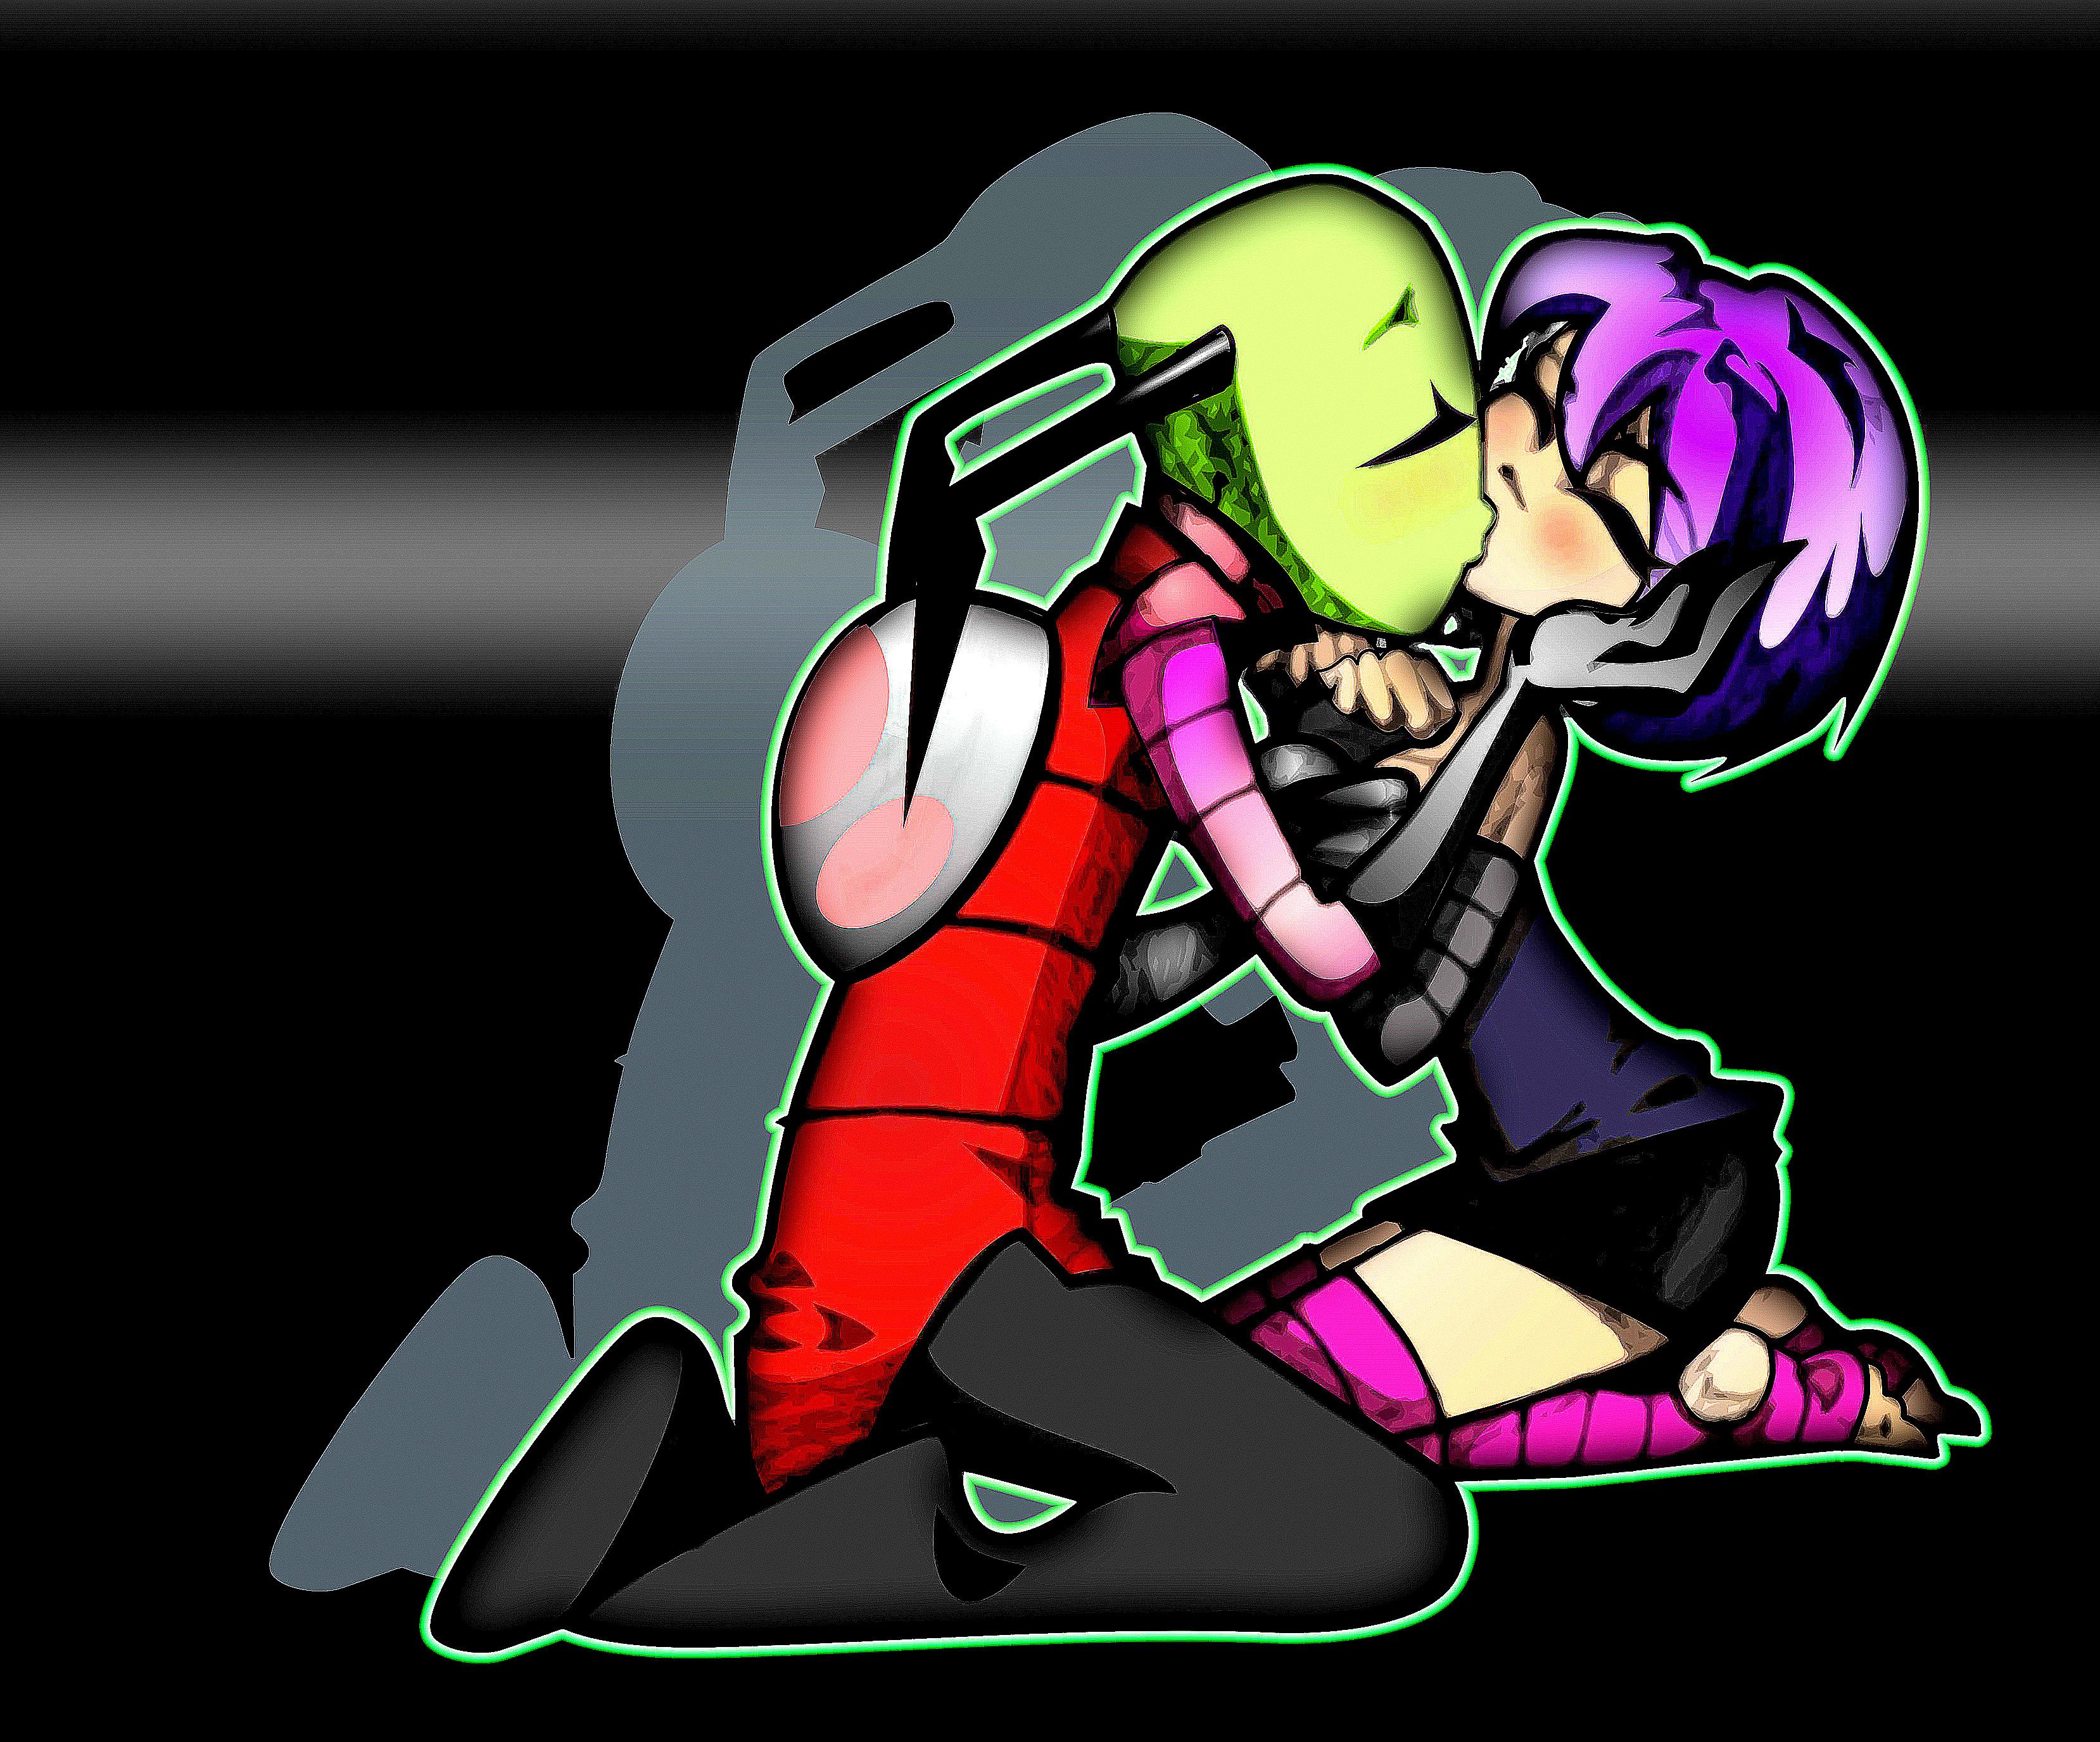 Zim And Gaz Anime Kiss Invader Zim/#564520 - ...